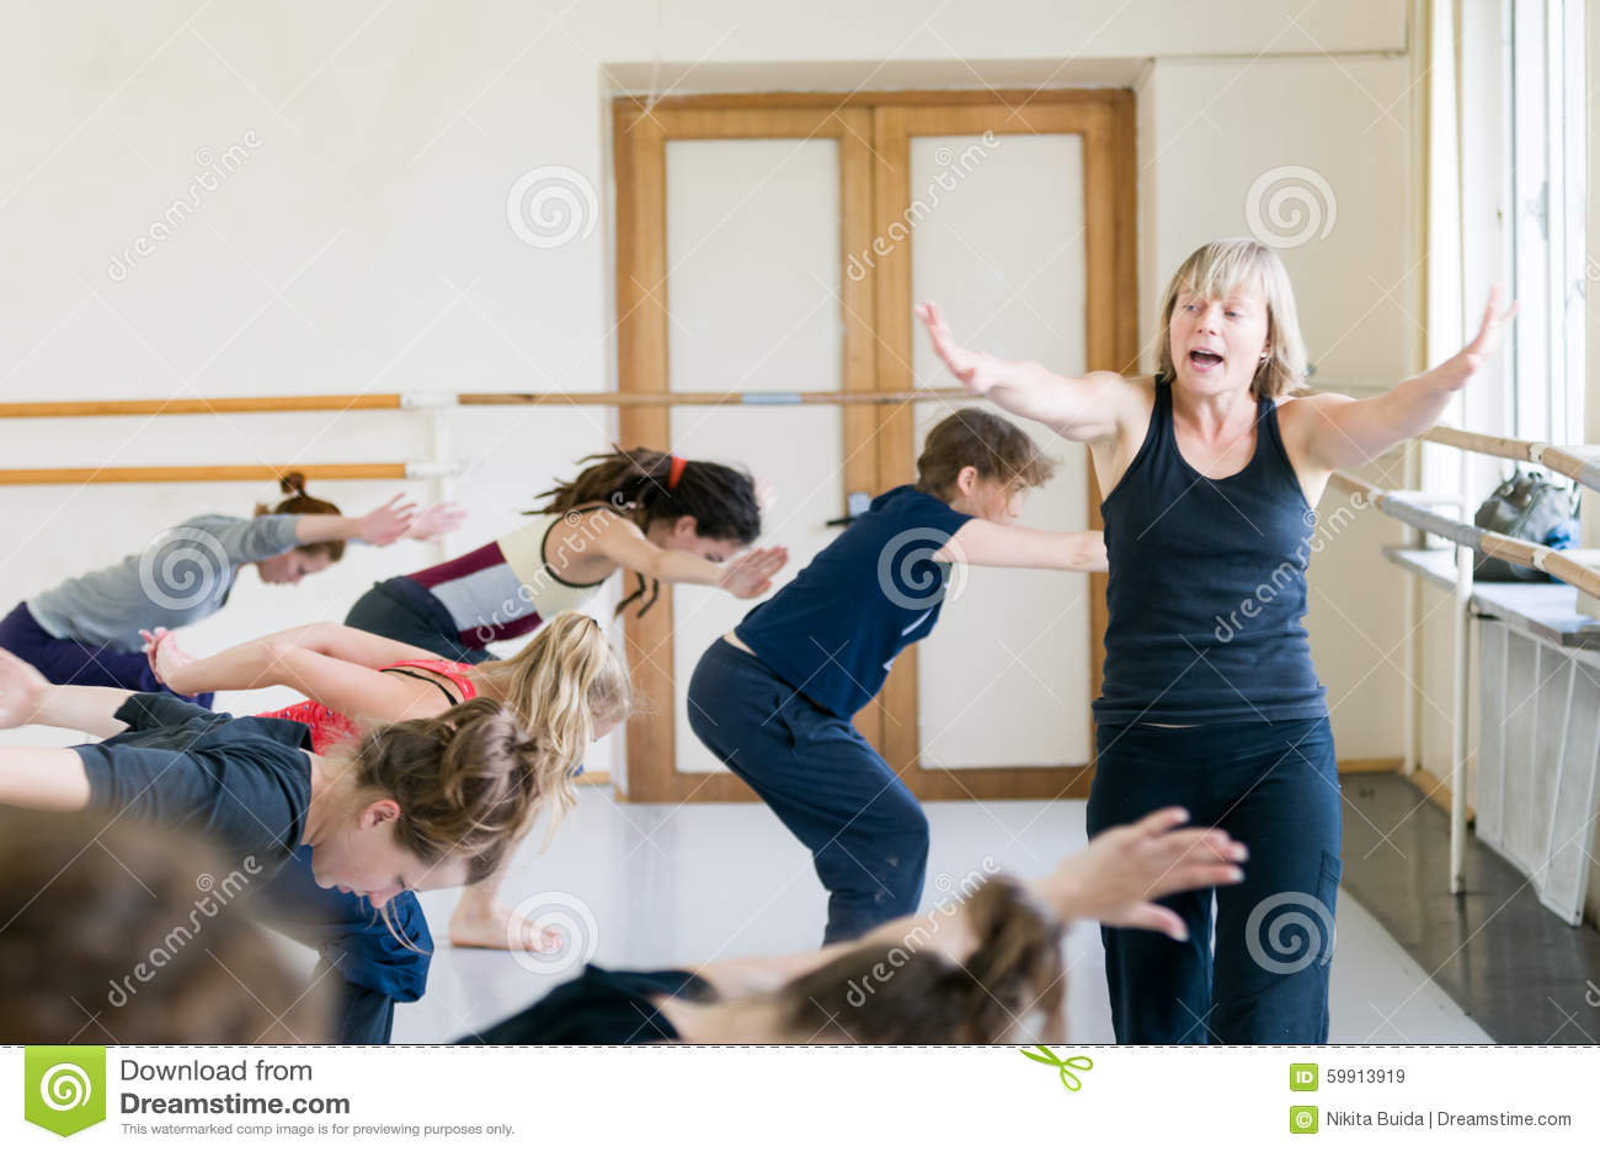 Dance school in Moscow 48